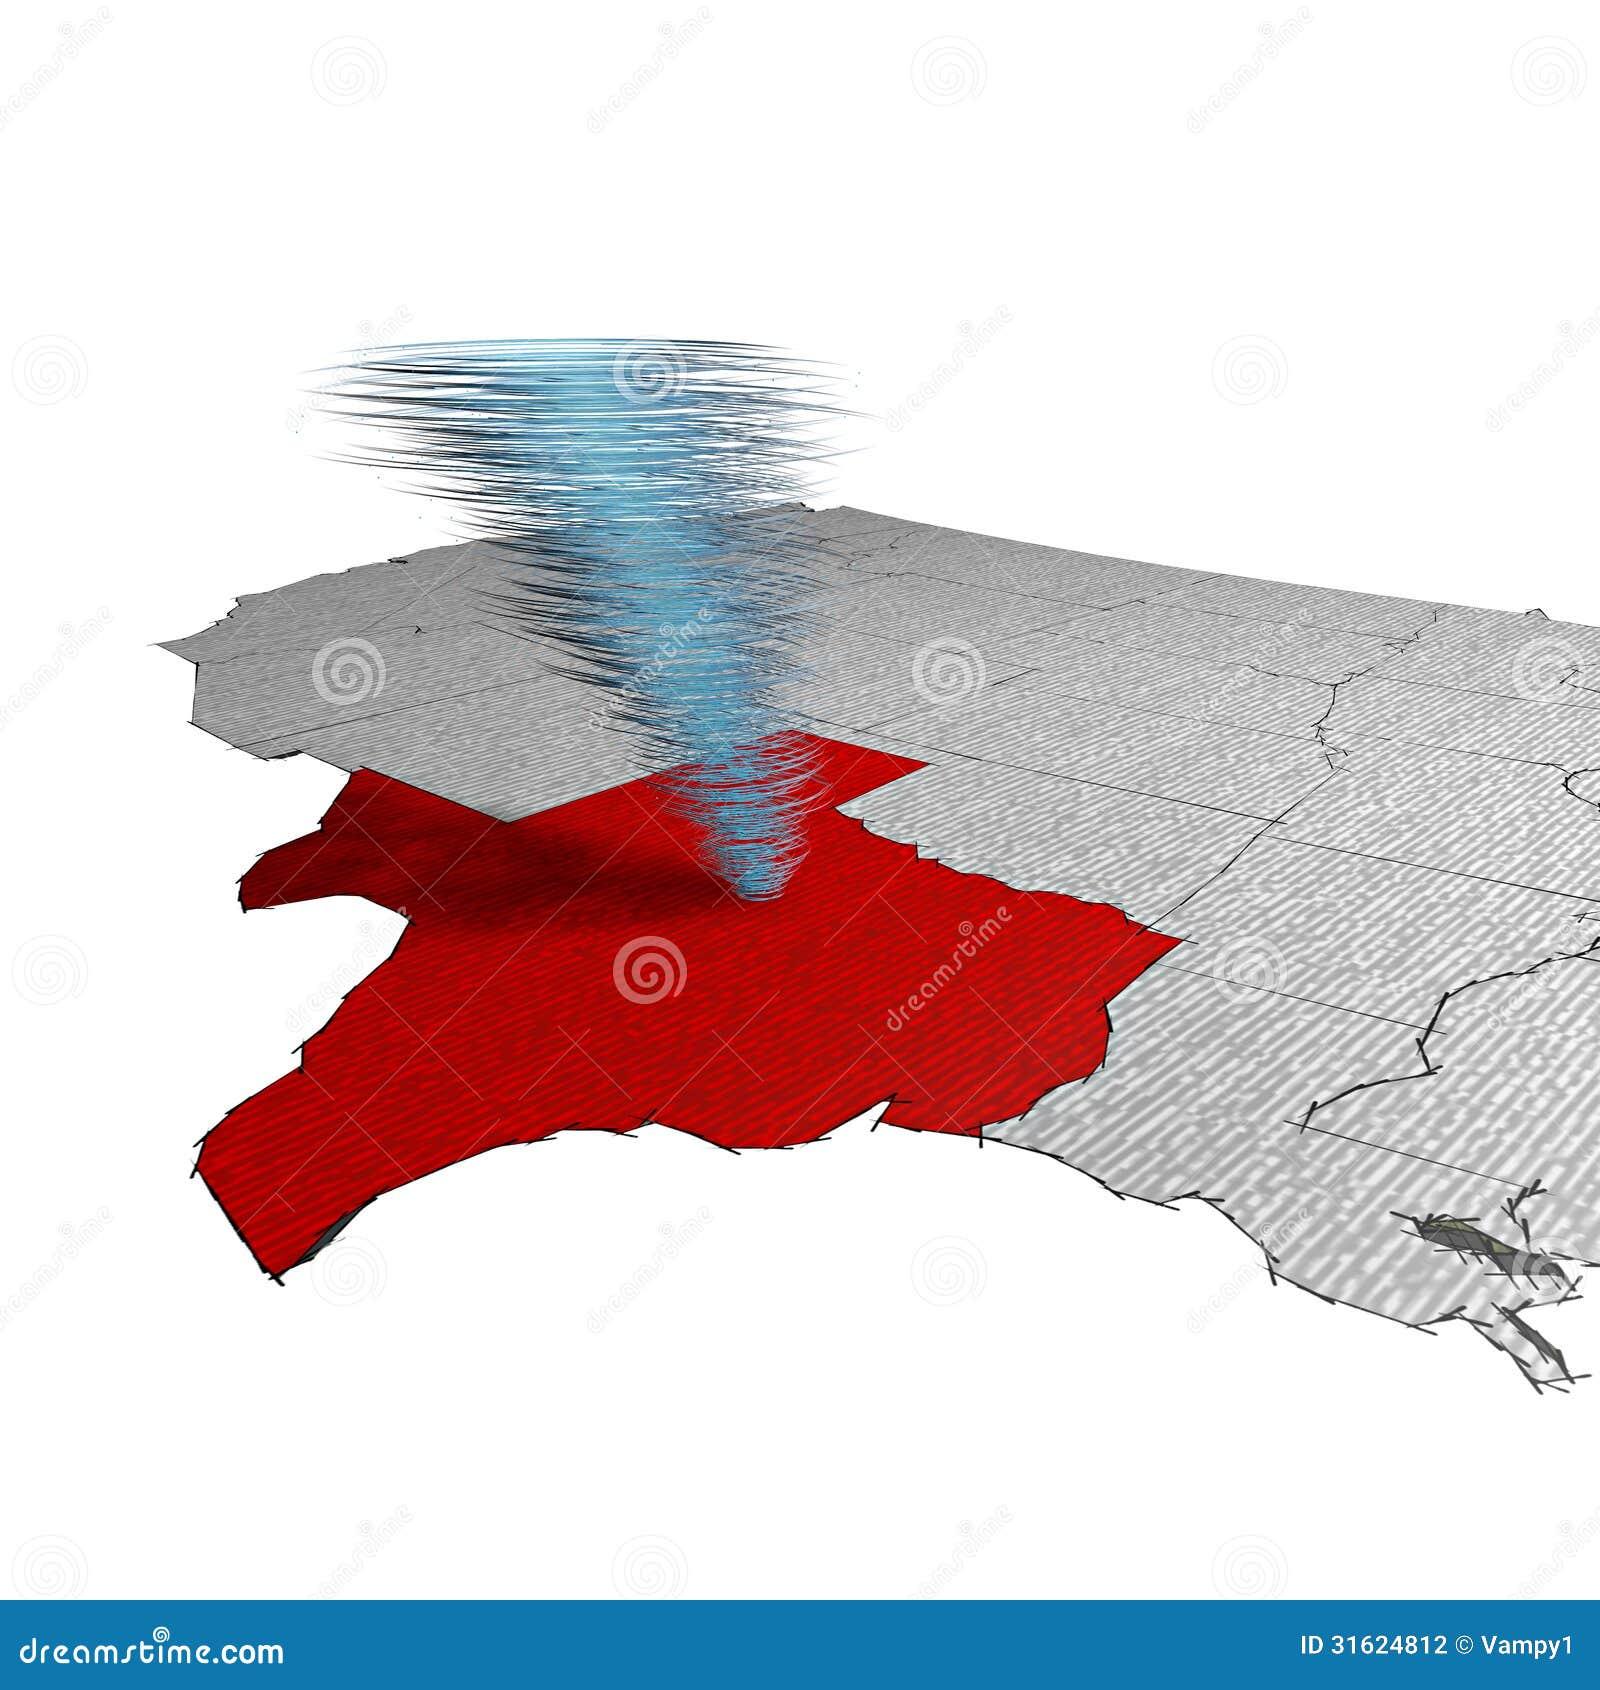 Map Of Tornadoes In Texas Yesterday.Tornado Texas Stock Illustration Illustration Of Arkansas 31624812